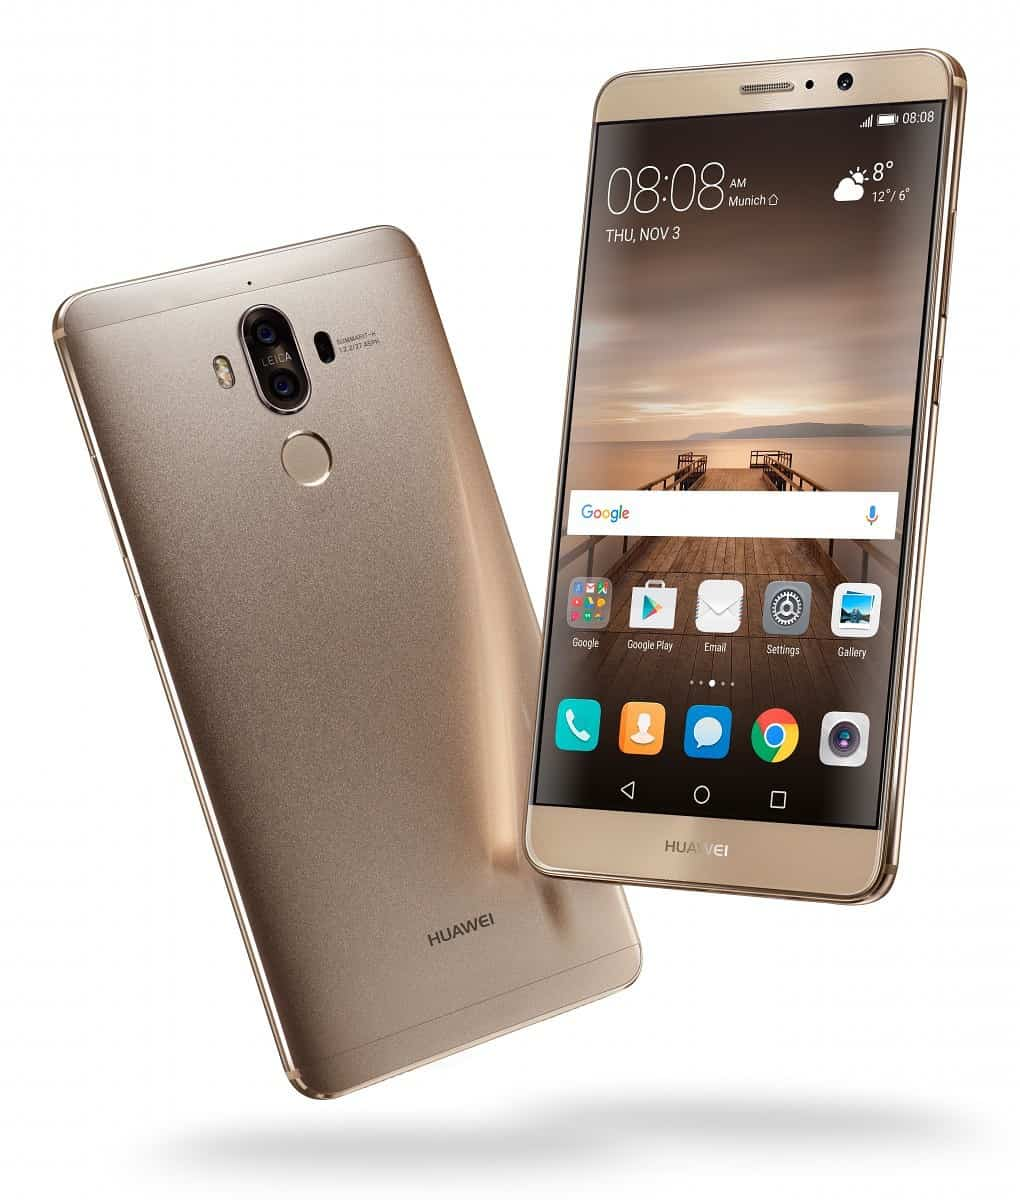 Pie para o Huawei Mate 9